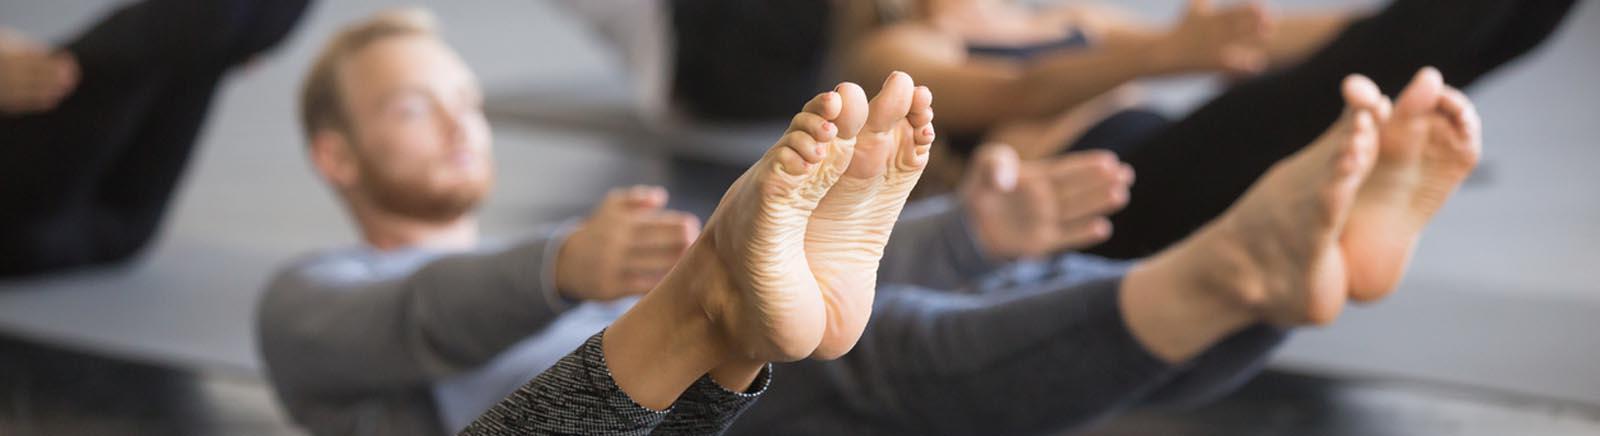 Pilates post image